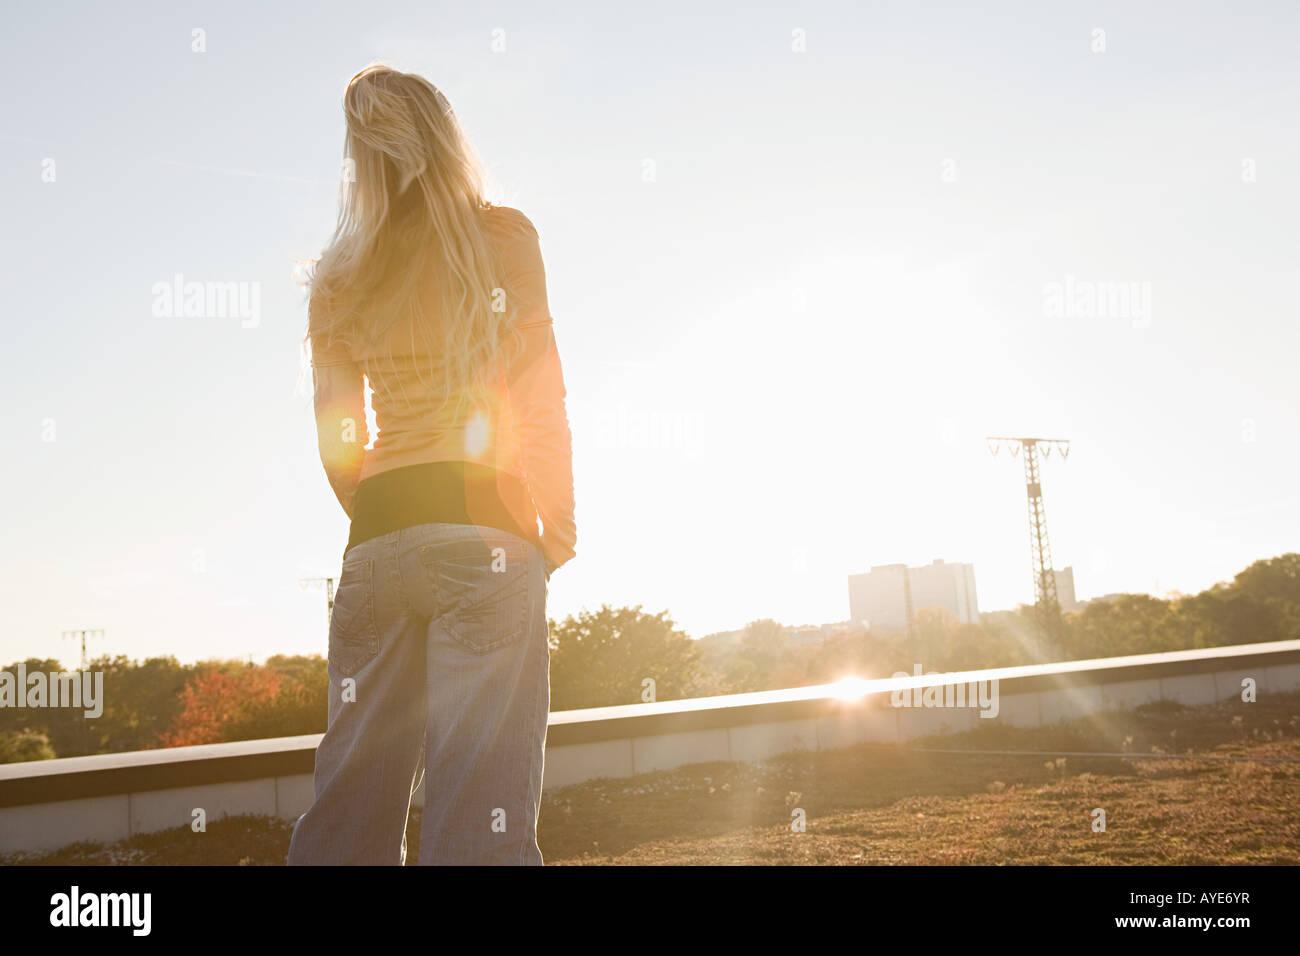 Young woman looking toward the sun - Stock Image